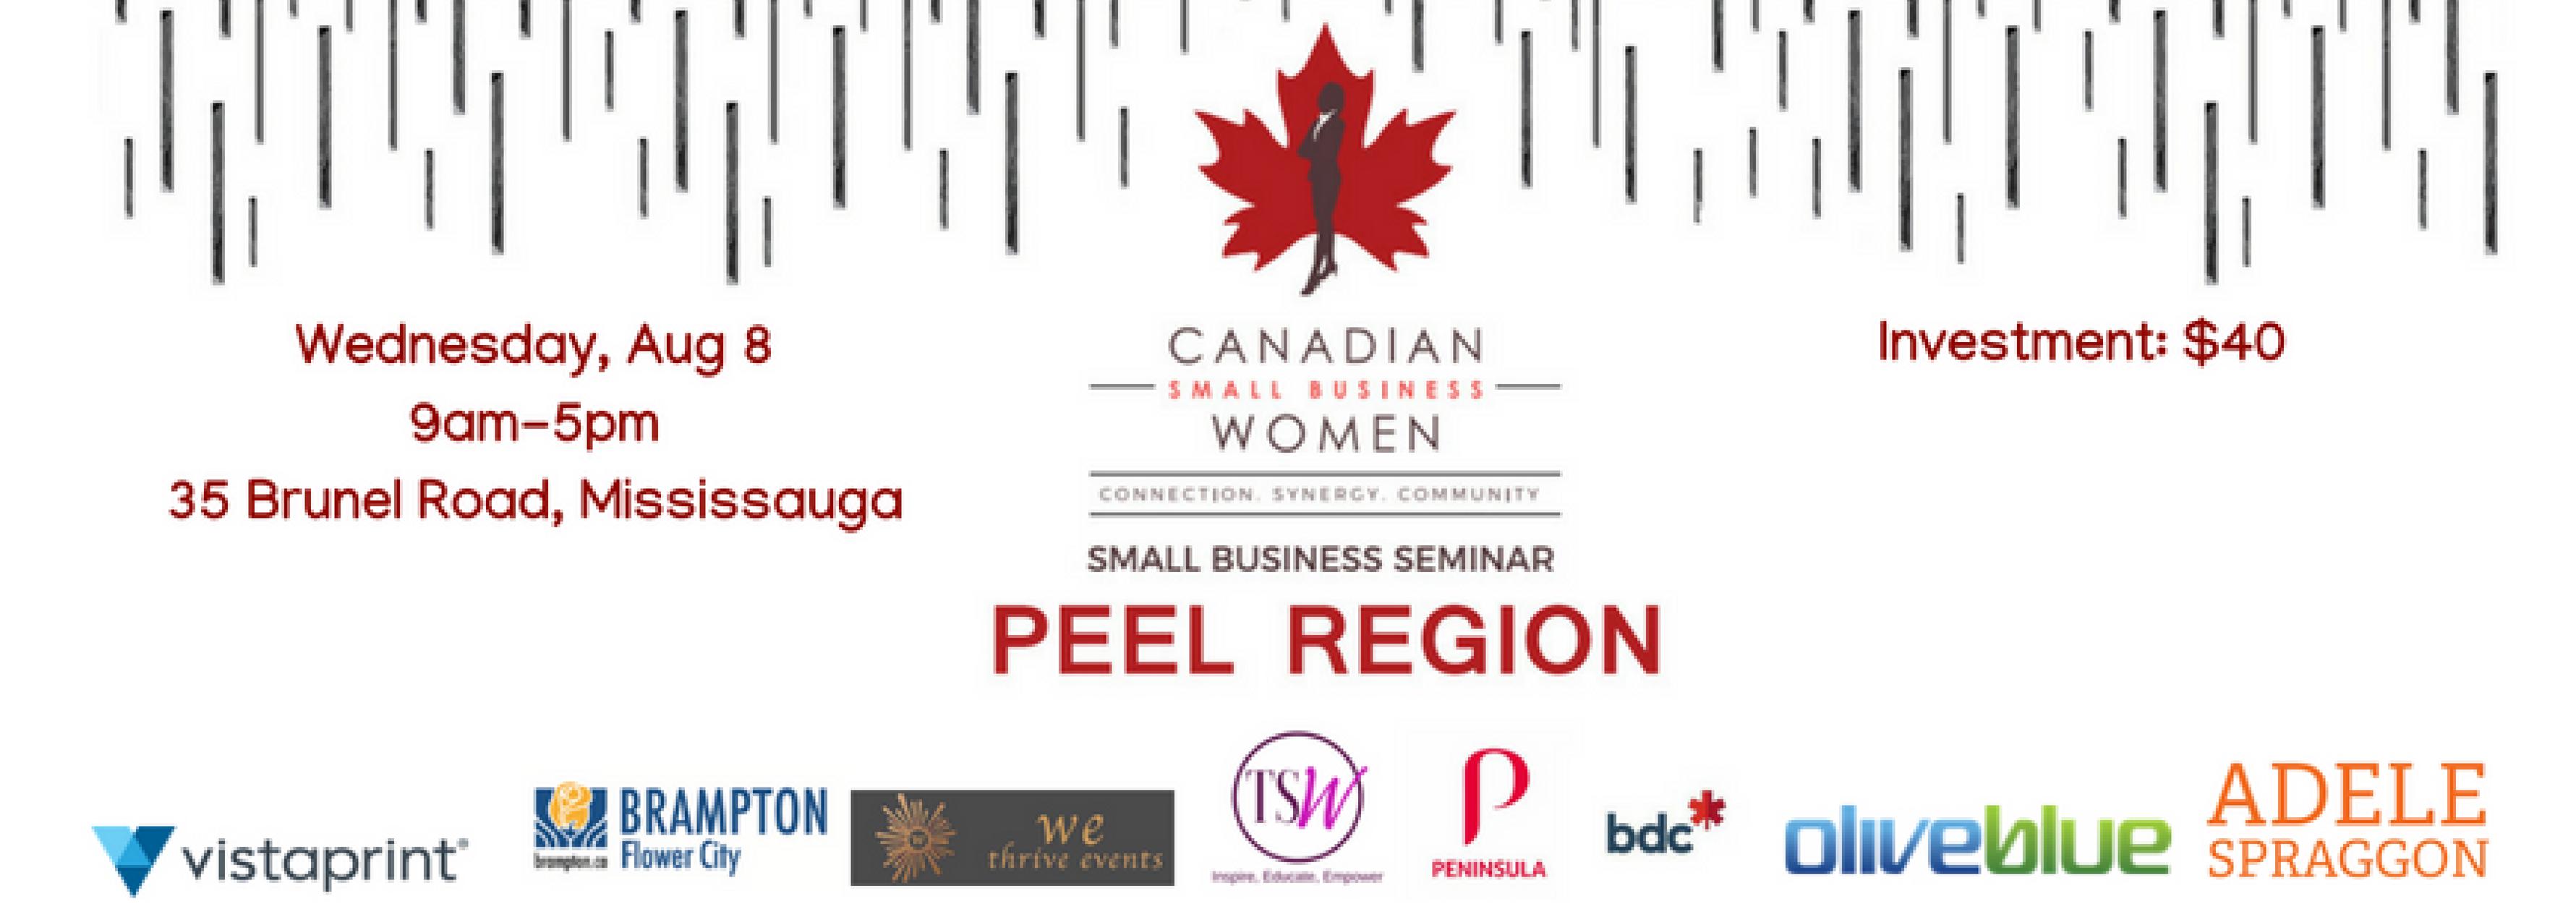 Small Business Seminar: Peel Region